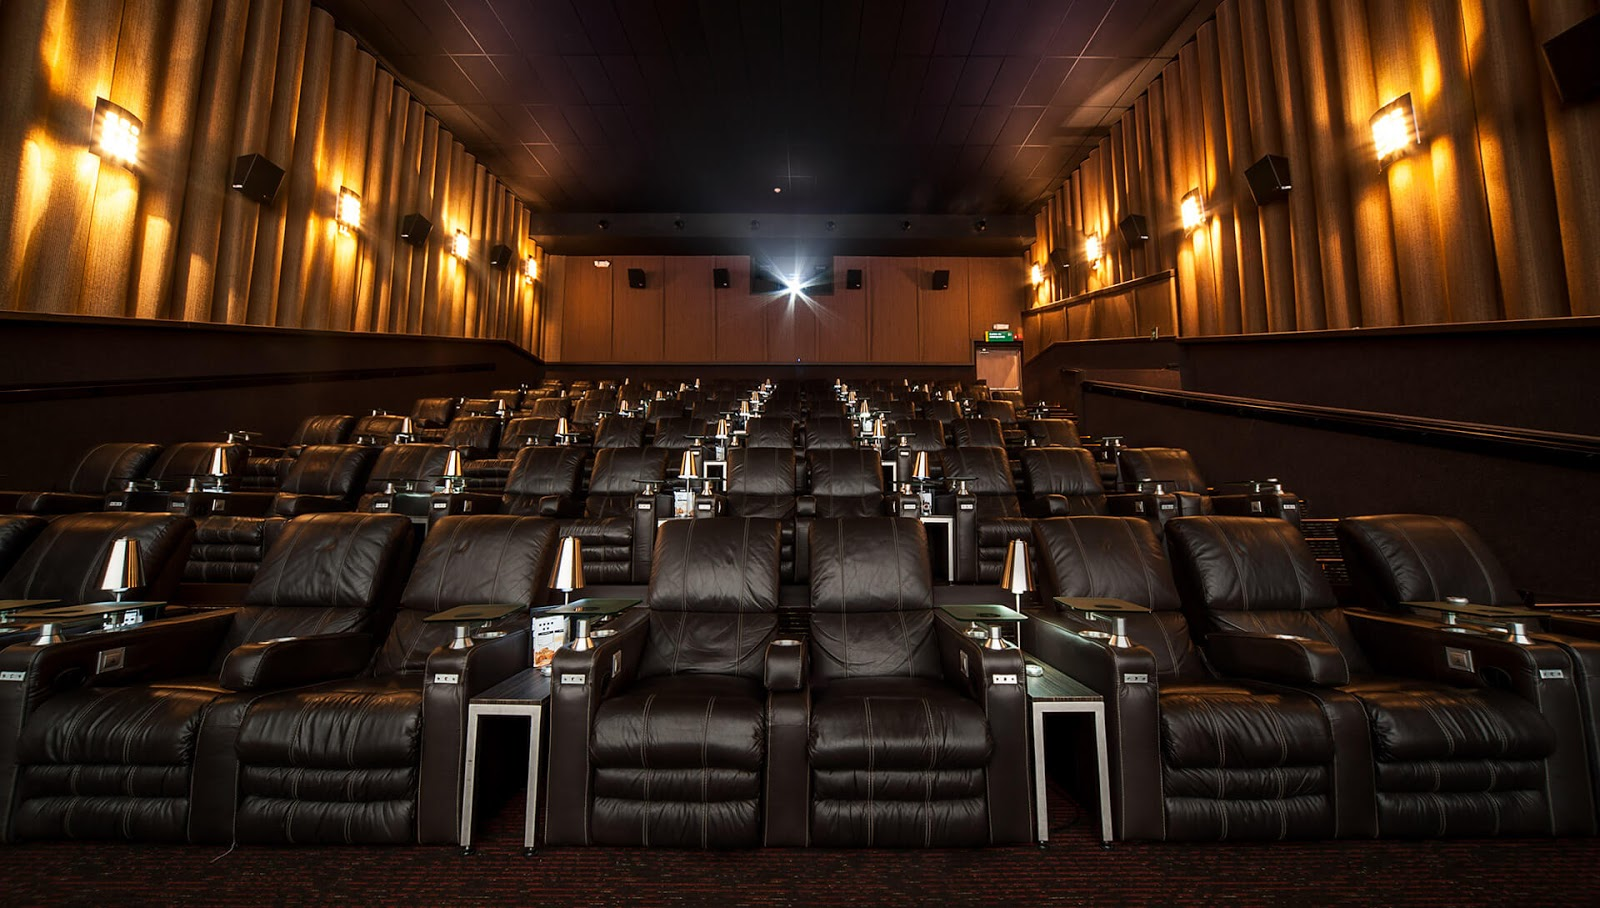 Cine covid protocolo sala de cine